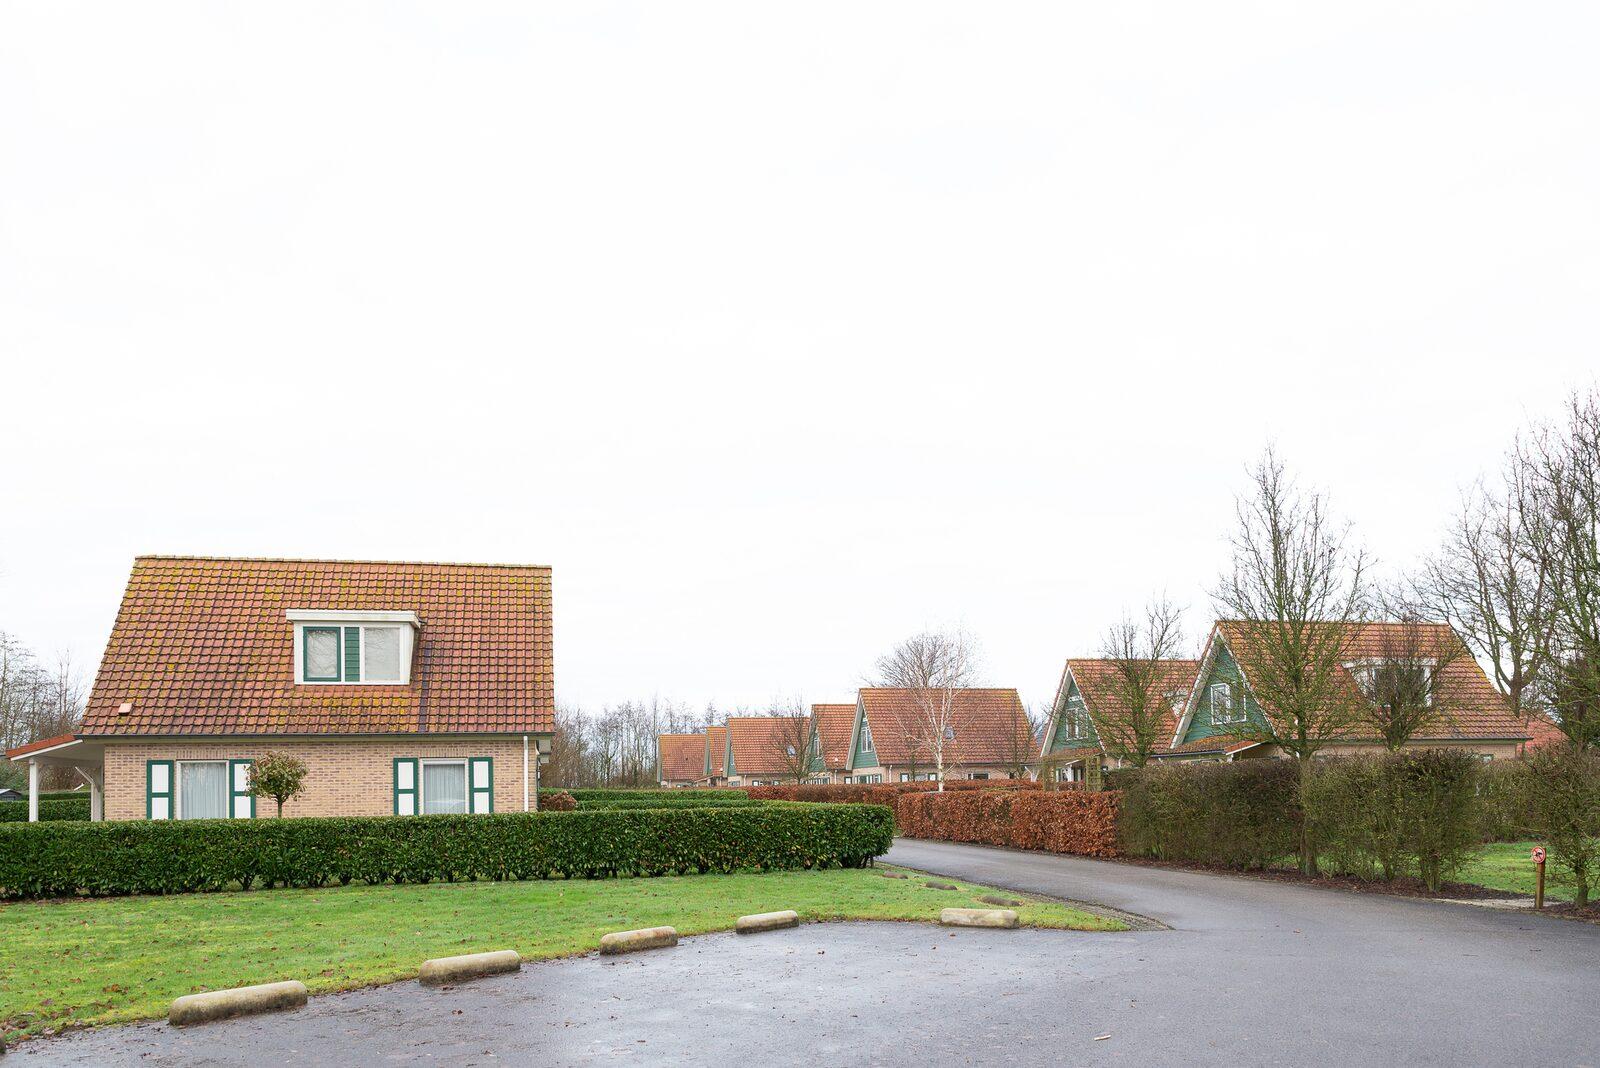 Ferienhaus - Zuidweg 18 | Zonnemaire Park Viletta 'Haus 10'